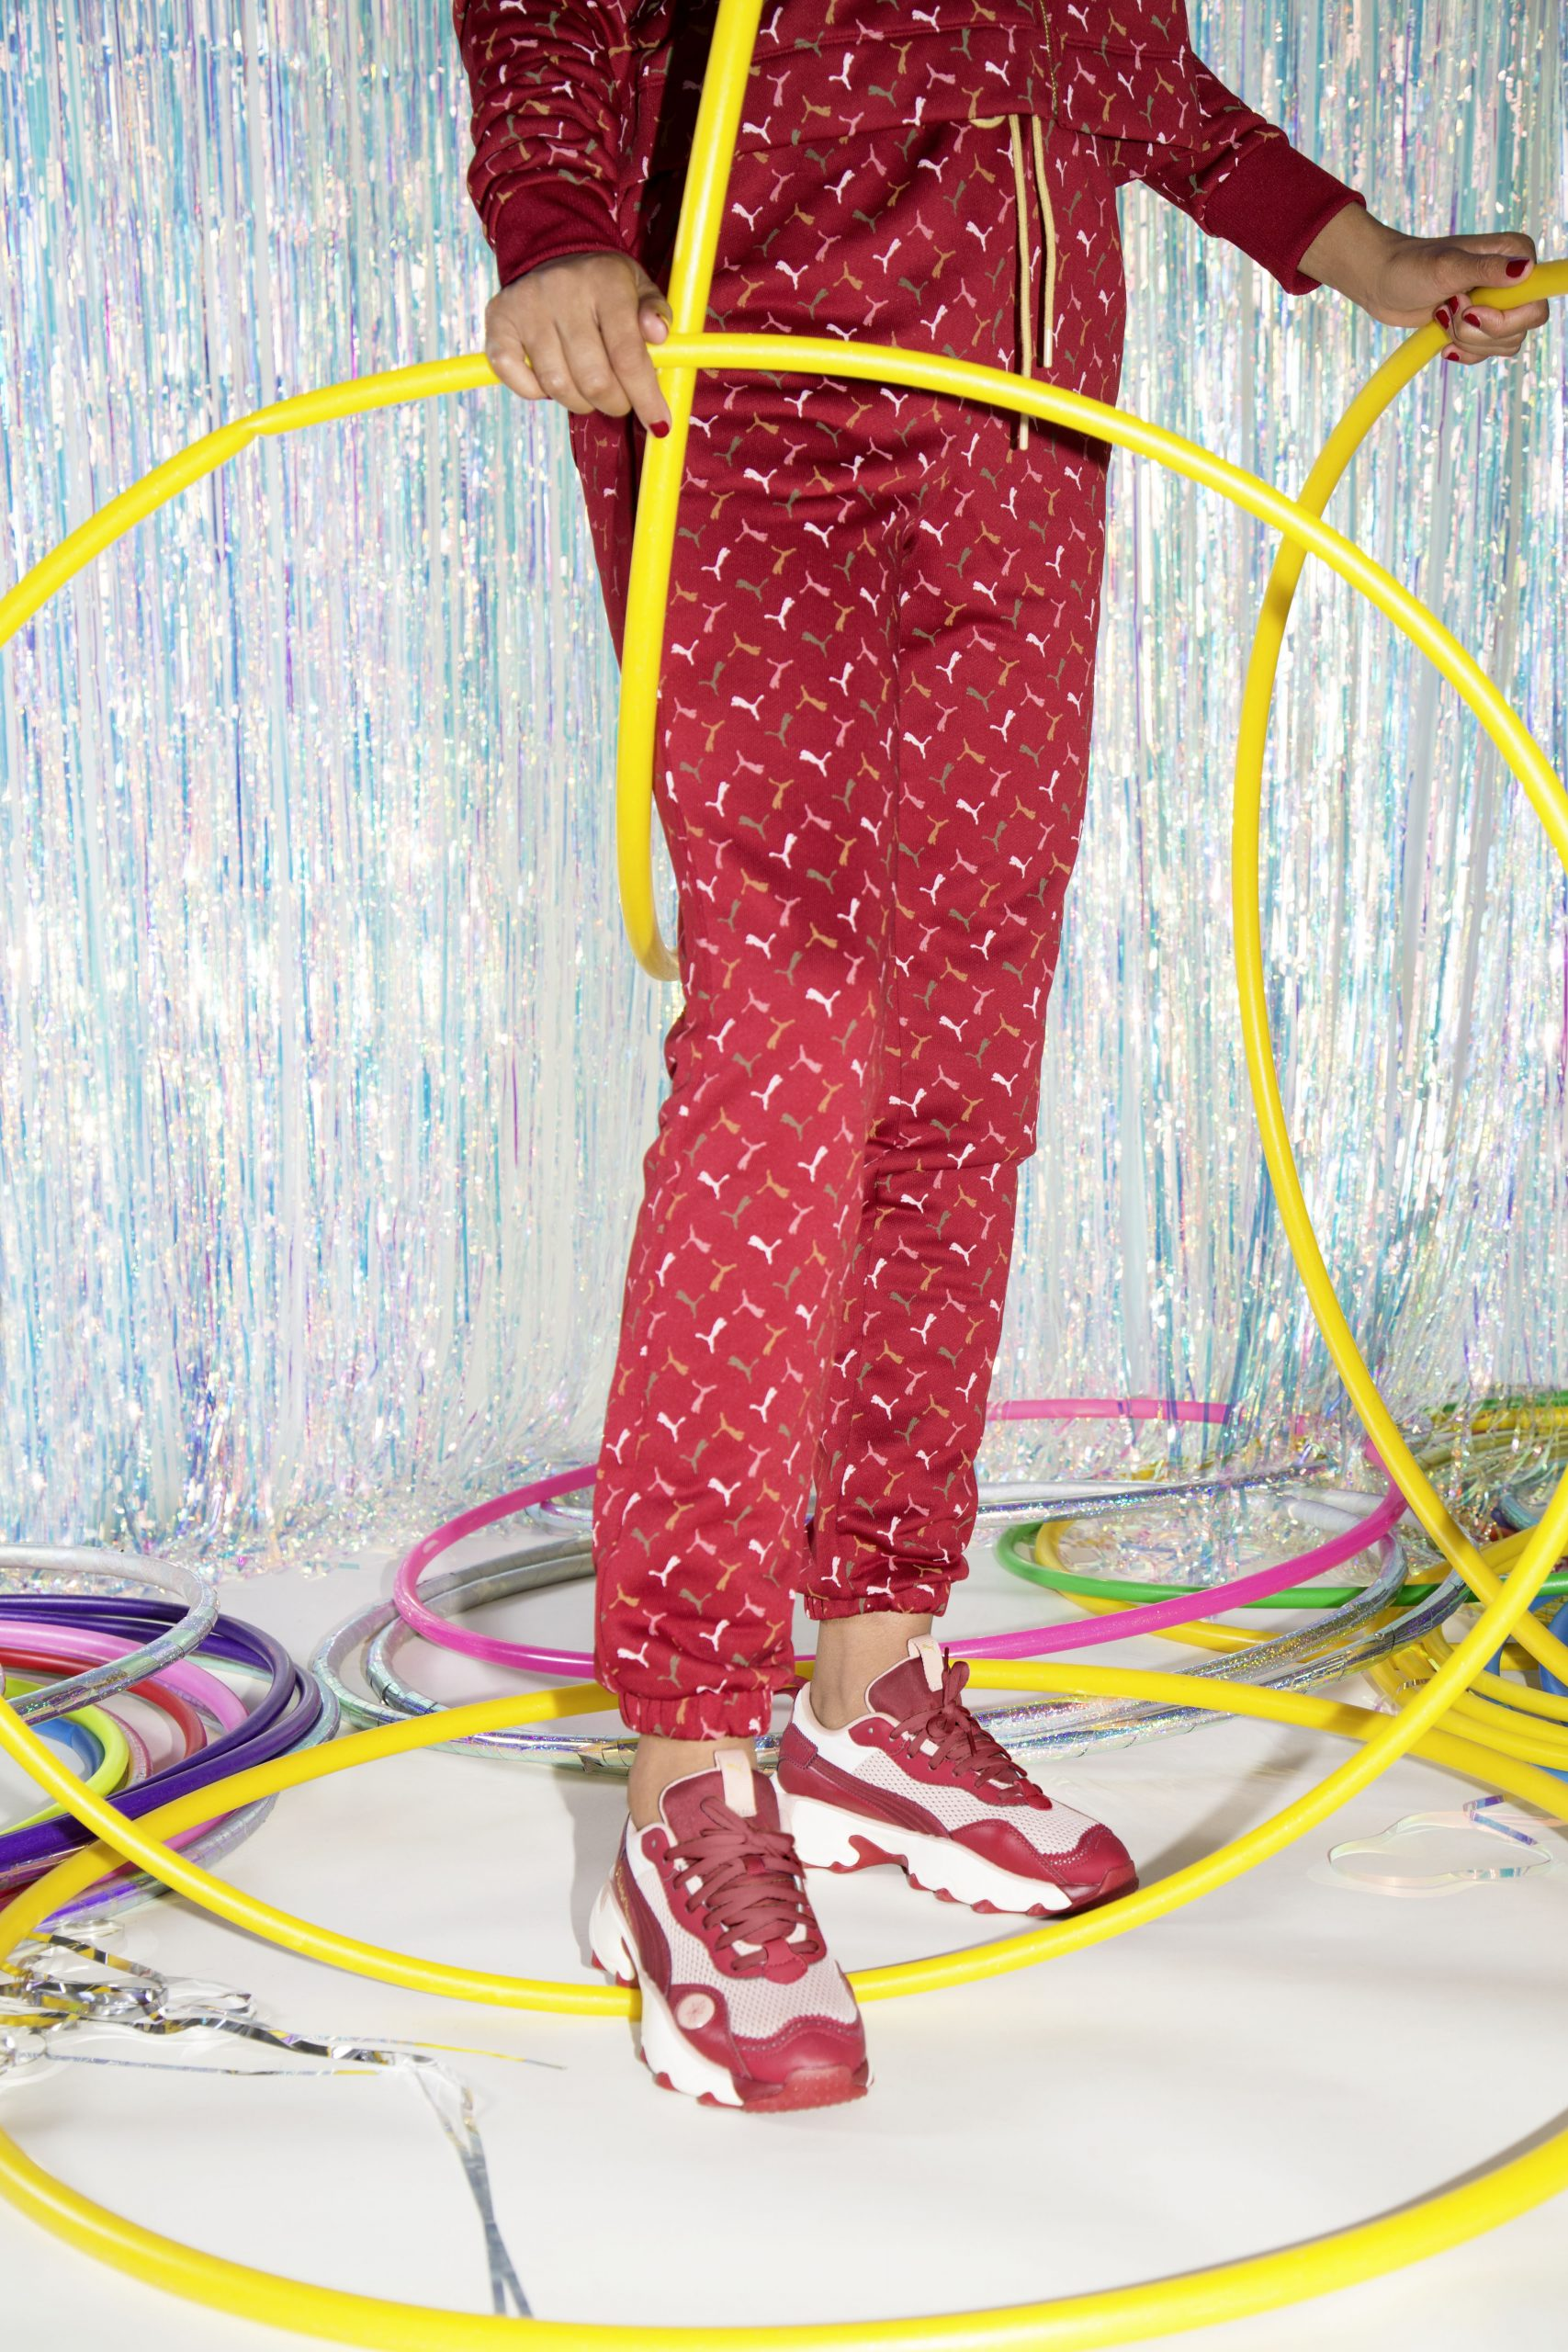 CHARLOTTE OLYMPIA × PUMA RISE NU & CALI WEDGE & MILE RIDER & PULSAR シャーロット・オリンピア × プーマ ライズ NU & カリ ウェッジ & マイル ライダー & パルサー 374337_01 374339_01 374338_01 374340_01 wearing